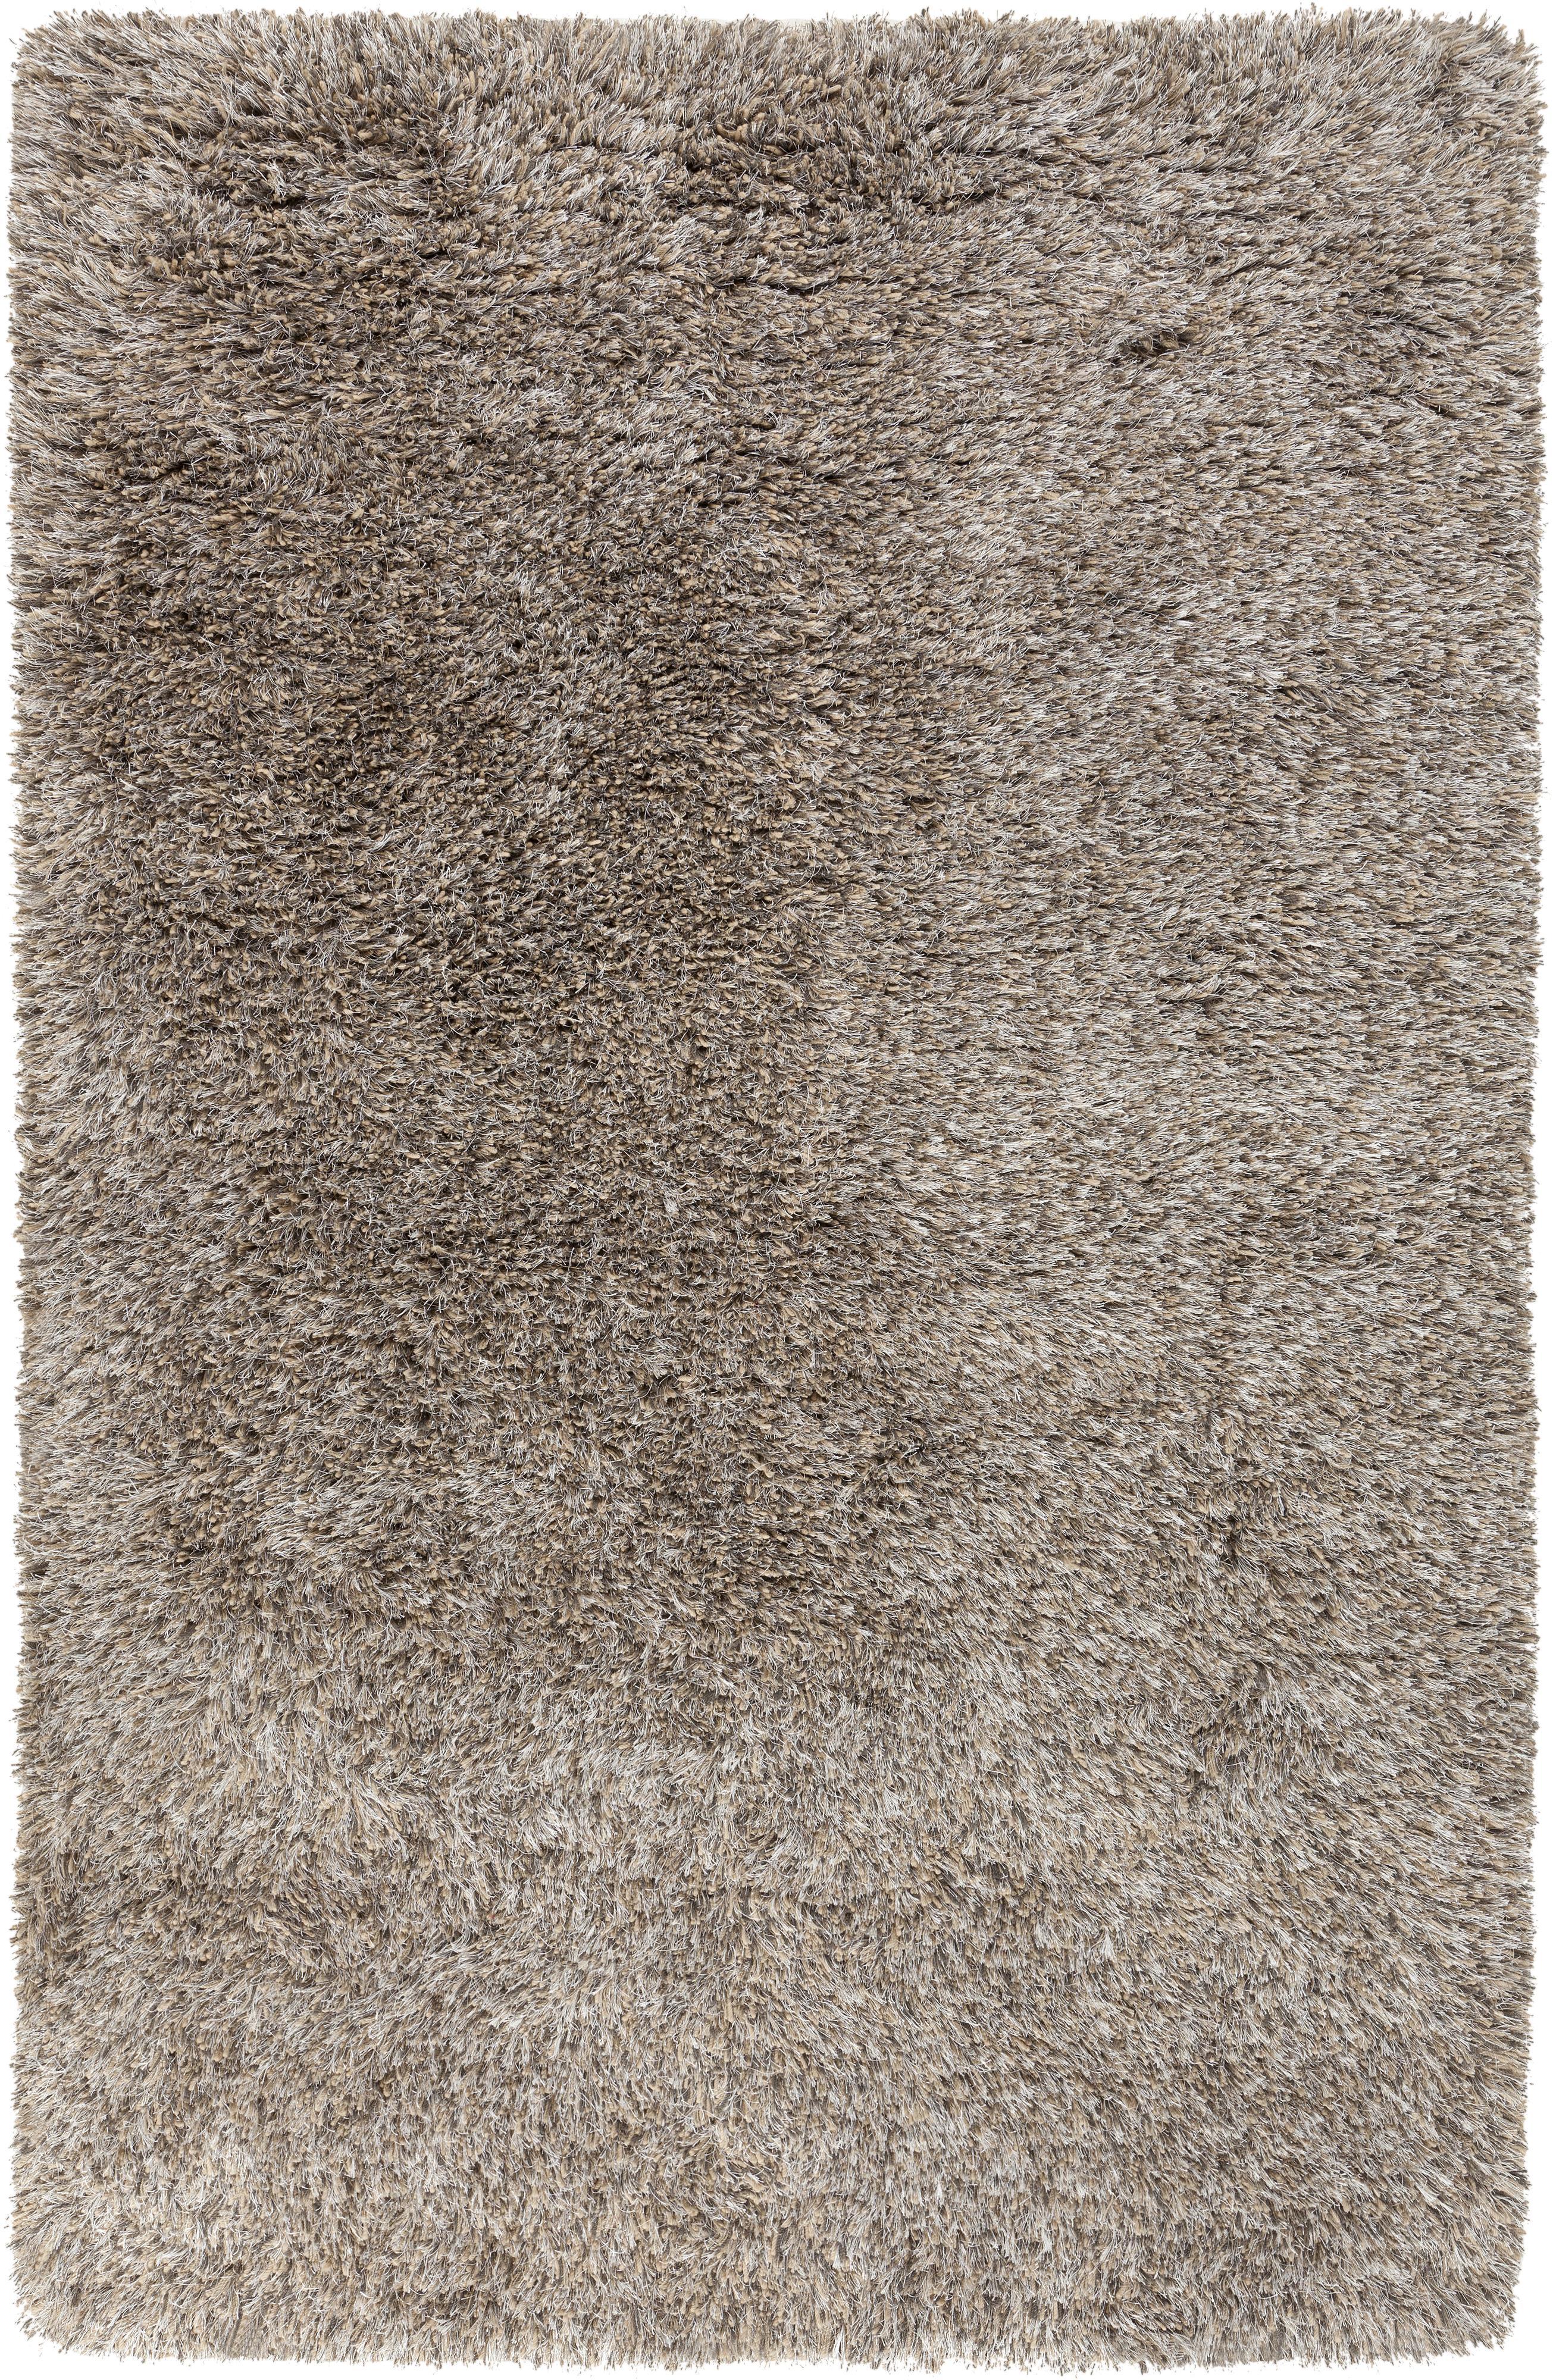 Surya Rugs Milan 5' x 8' - Item Number: MIL5002-58